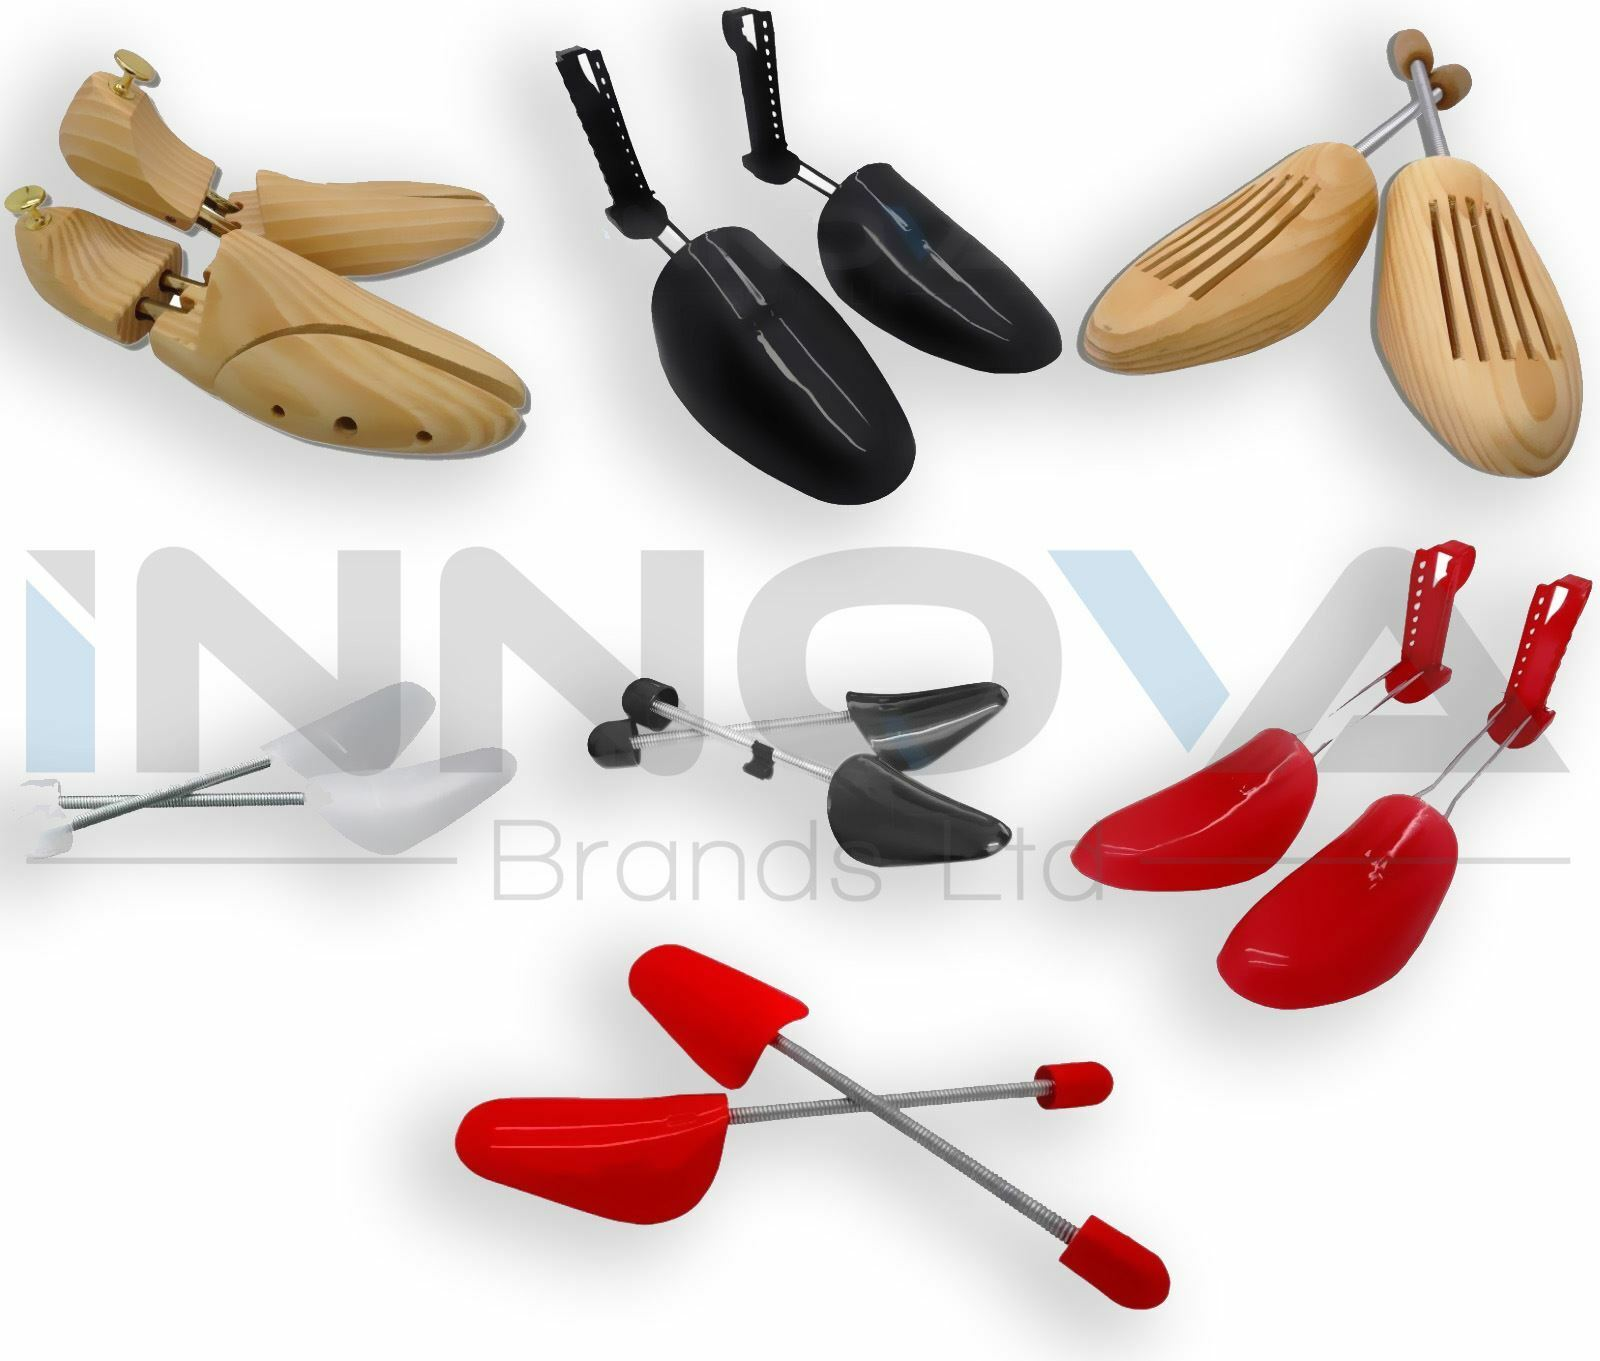 femmes hommes embauchoir arbres maintenir forme chaussures plastique vari s ebay. Black Bedroom Furniture Sets. Home Design Ideas